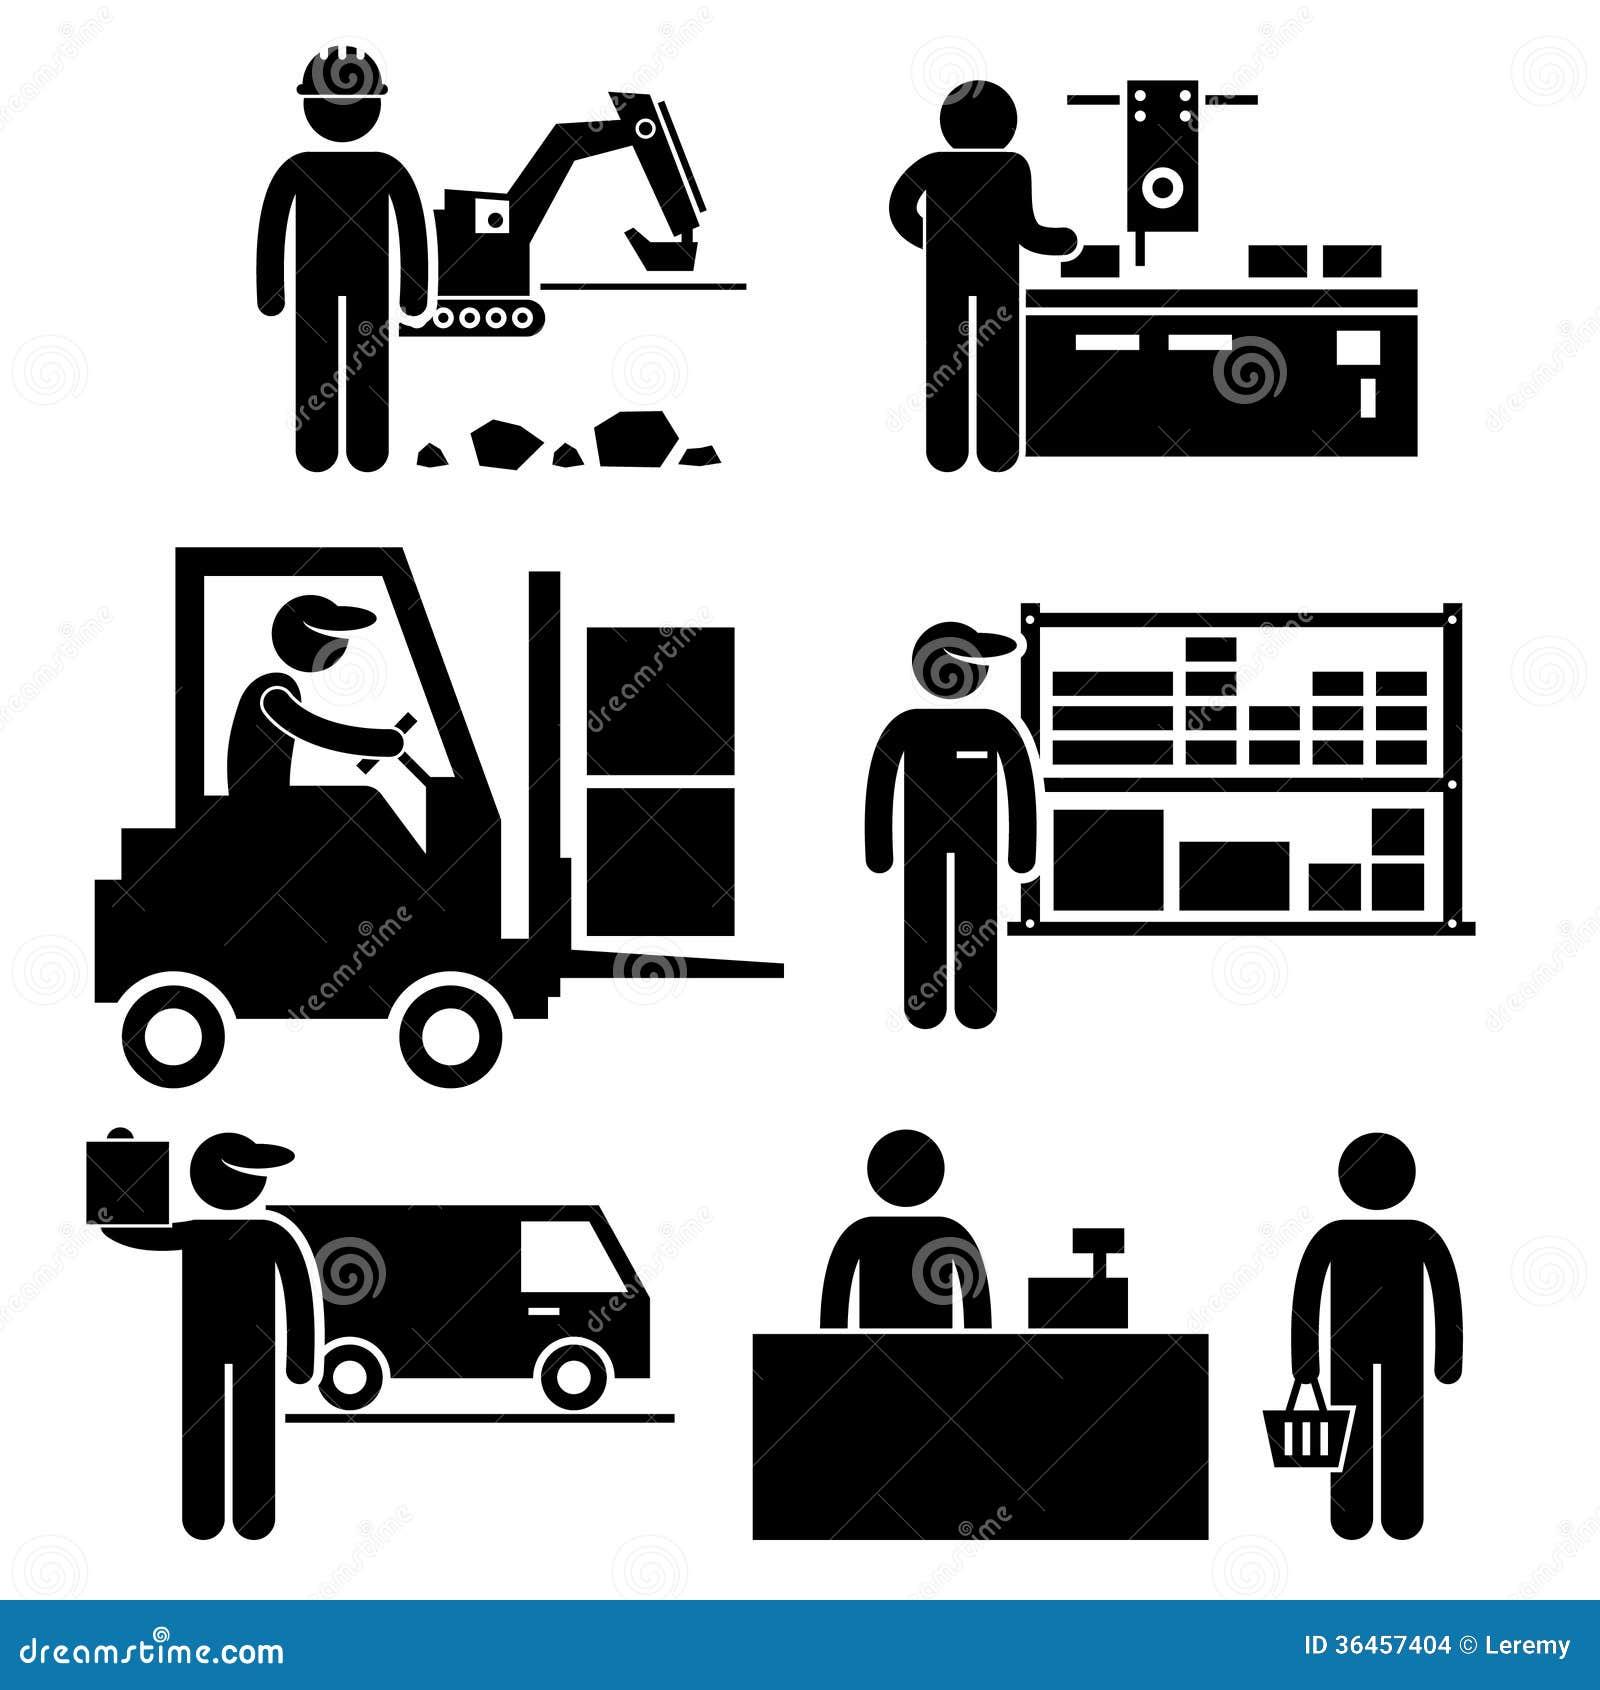 Geschäfts-Ökosystem-Piktogramm Stockbilder - Bild: 36457404